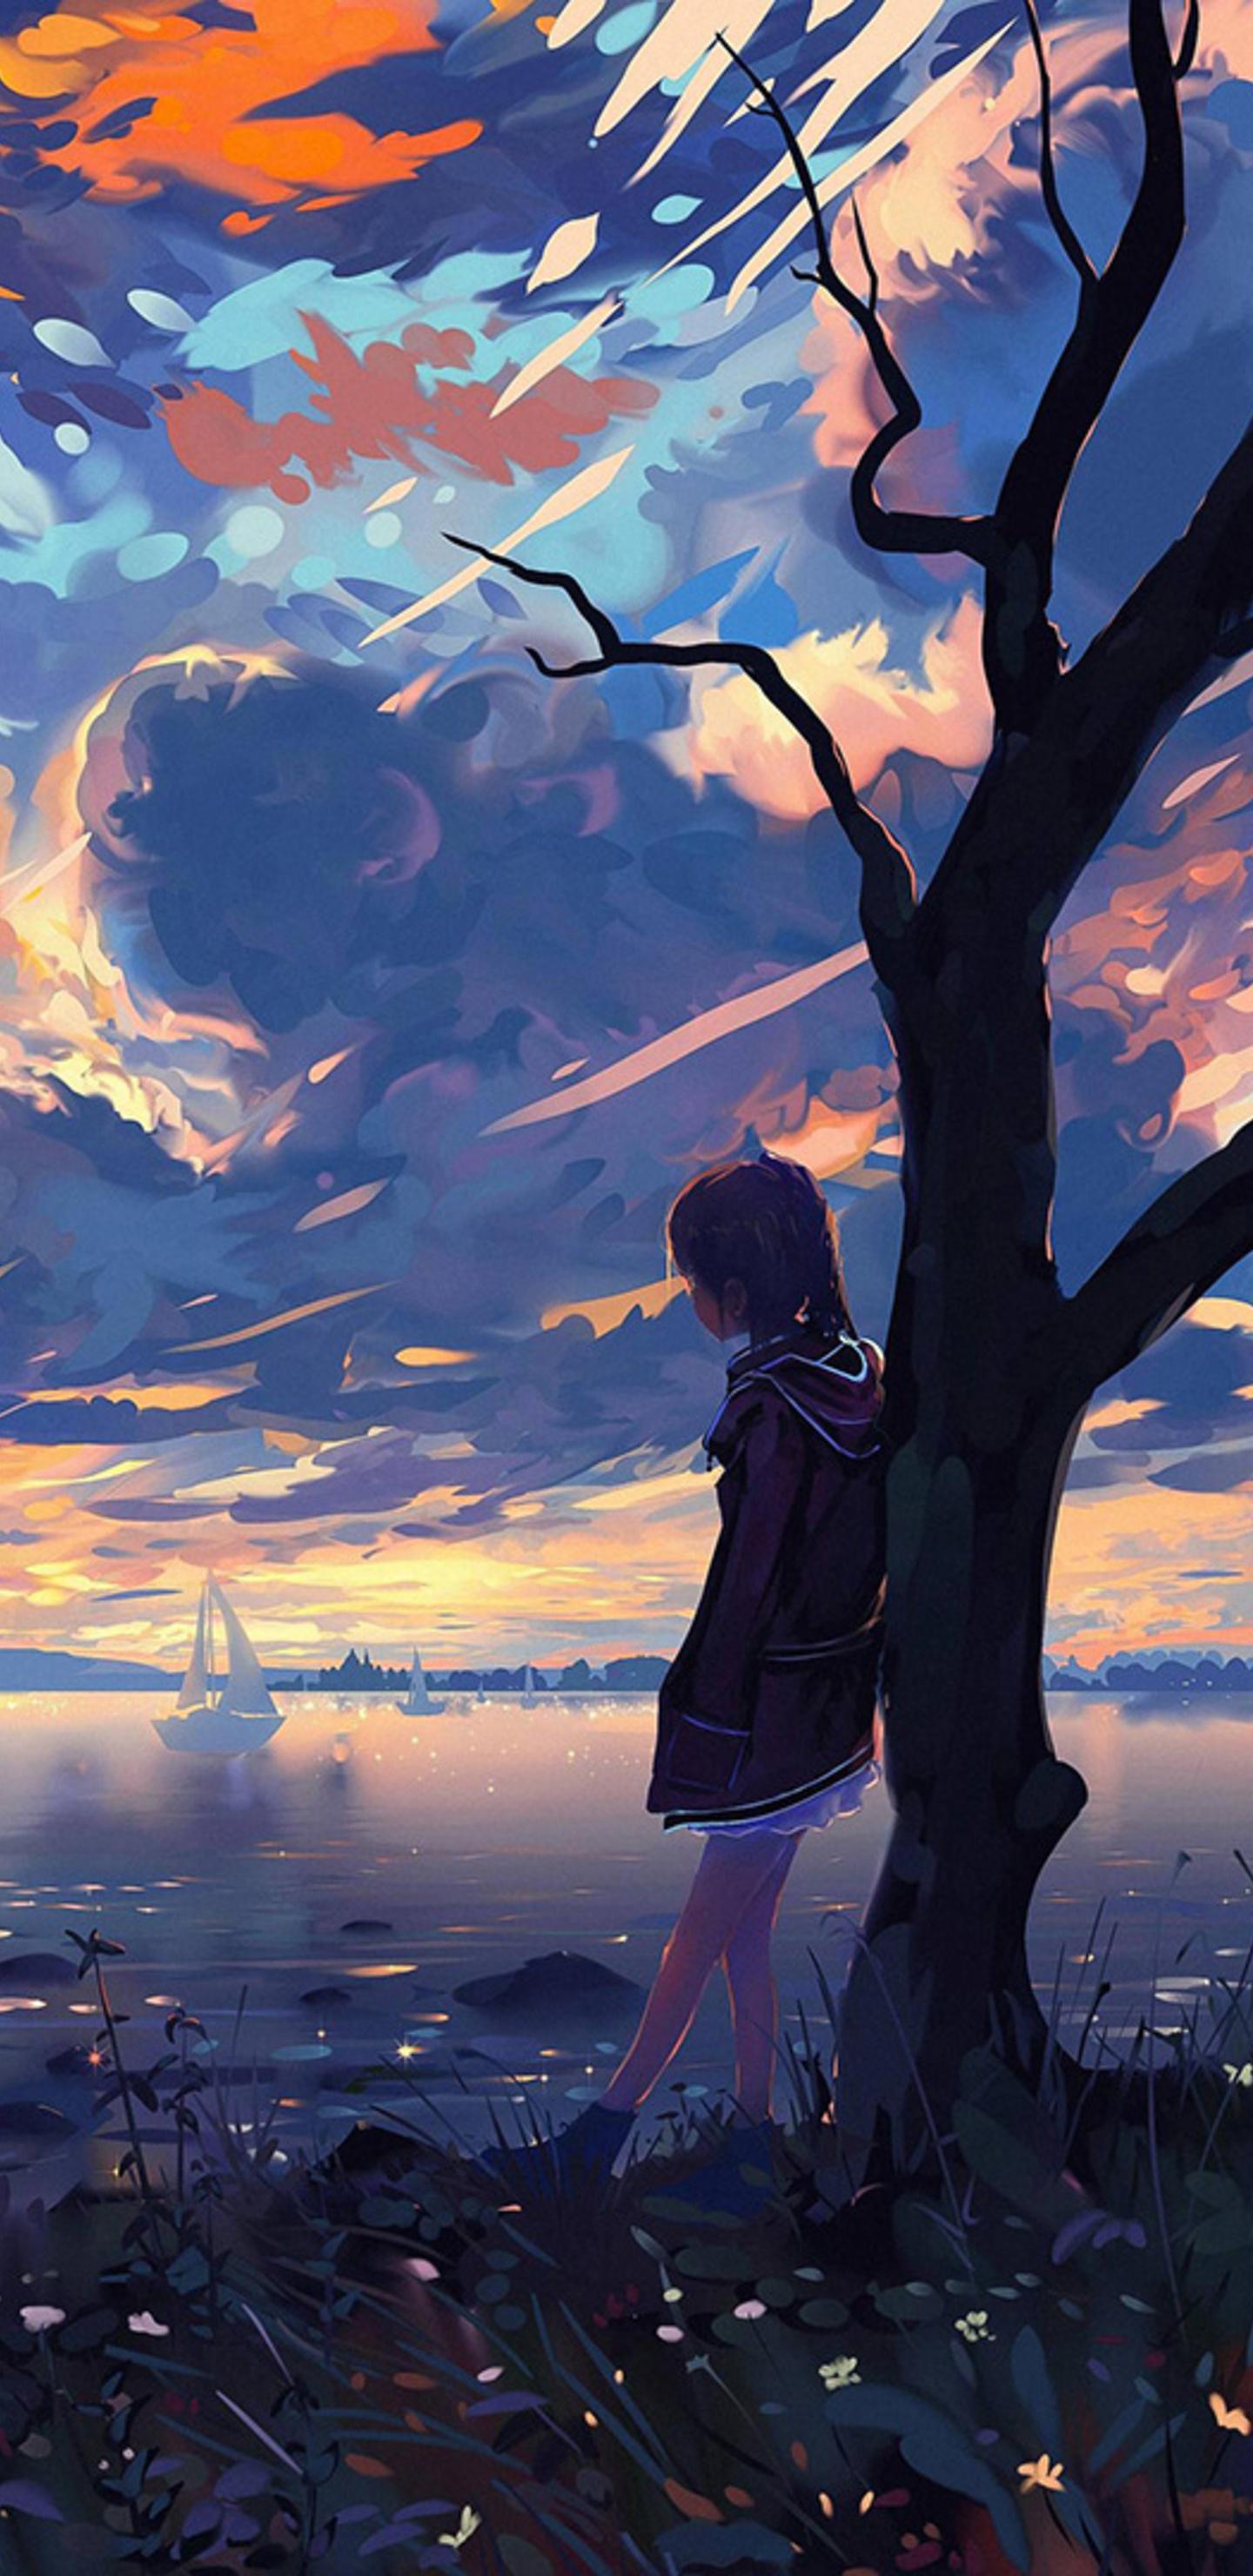 Alone boy standing near coast boats samsung galaxy note 98 s9s8s8 qhd